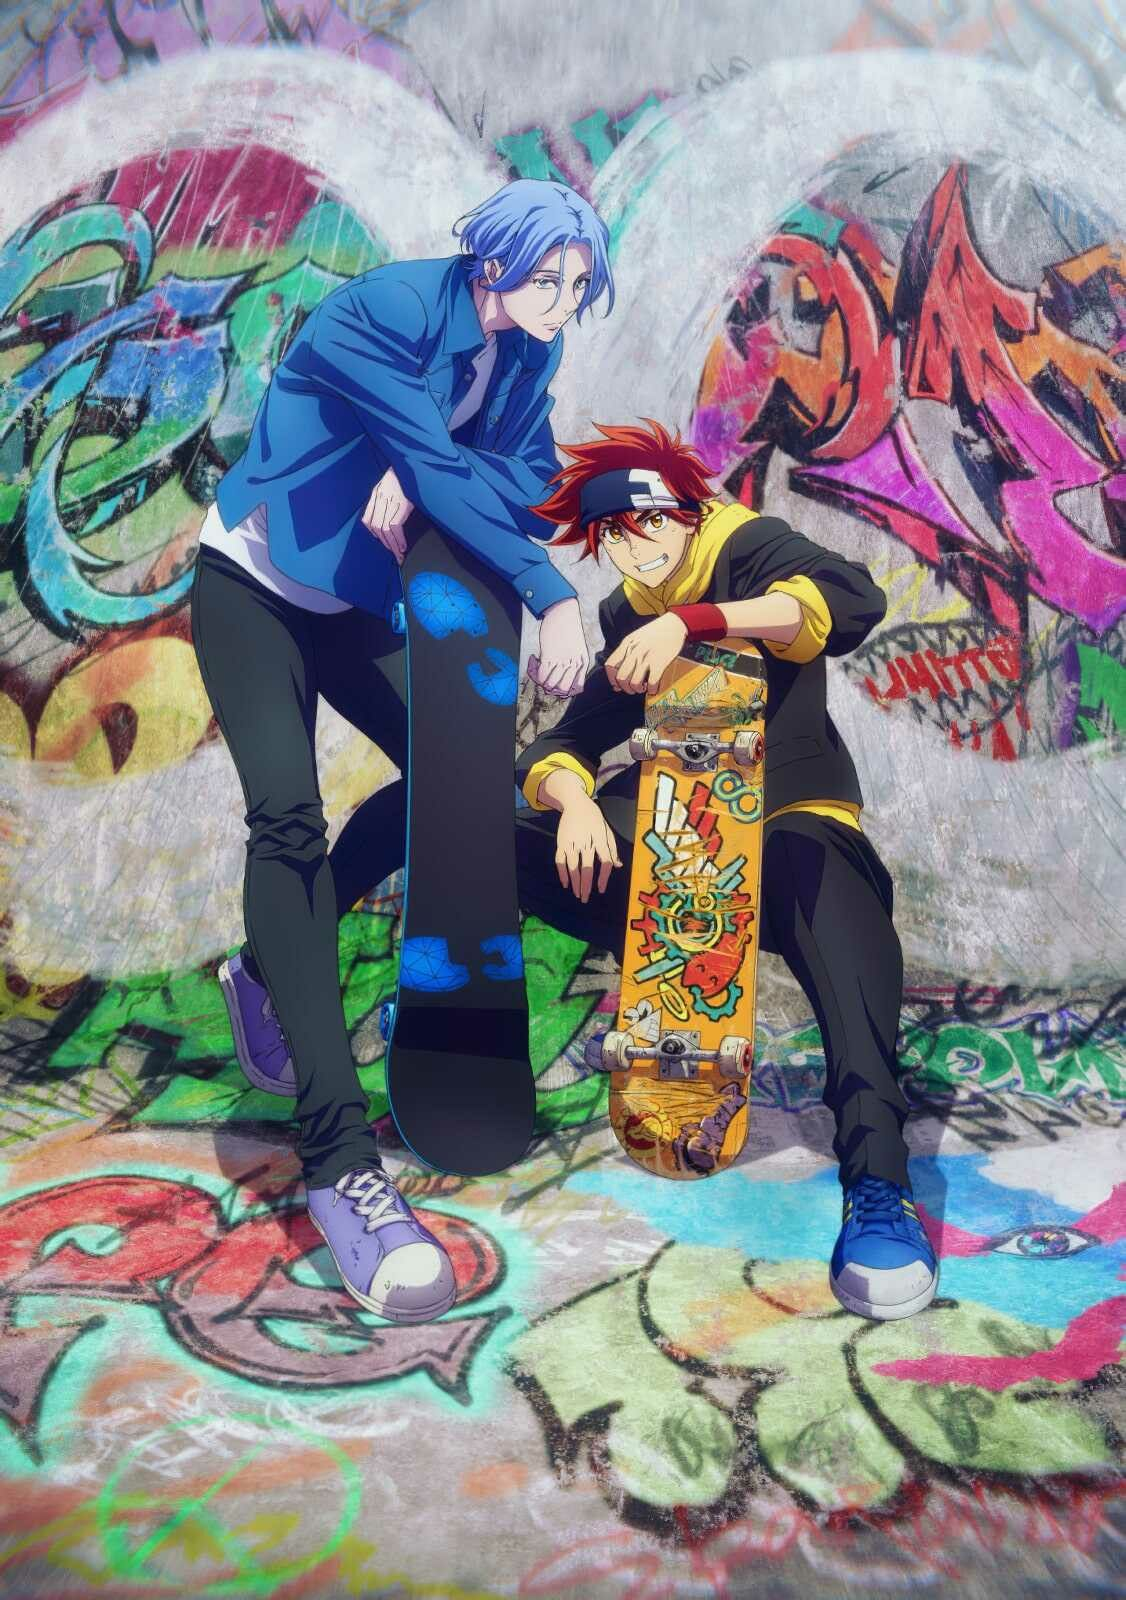 SK∞ LANGA & REKI in 2021 | Anime, Reki, Anime wall art